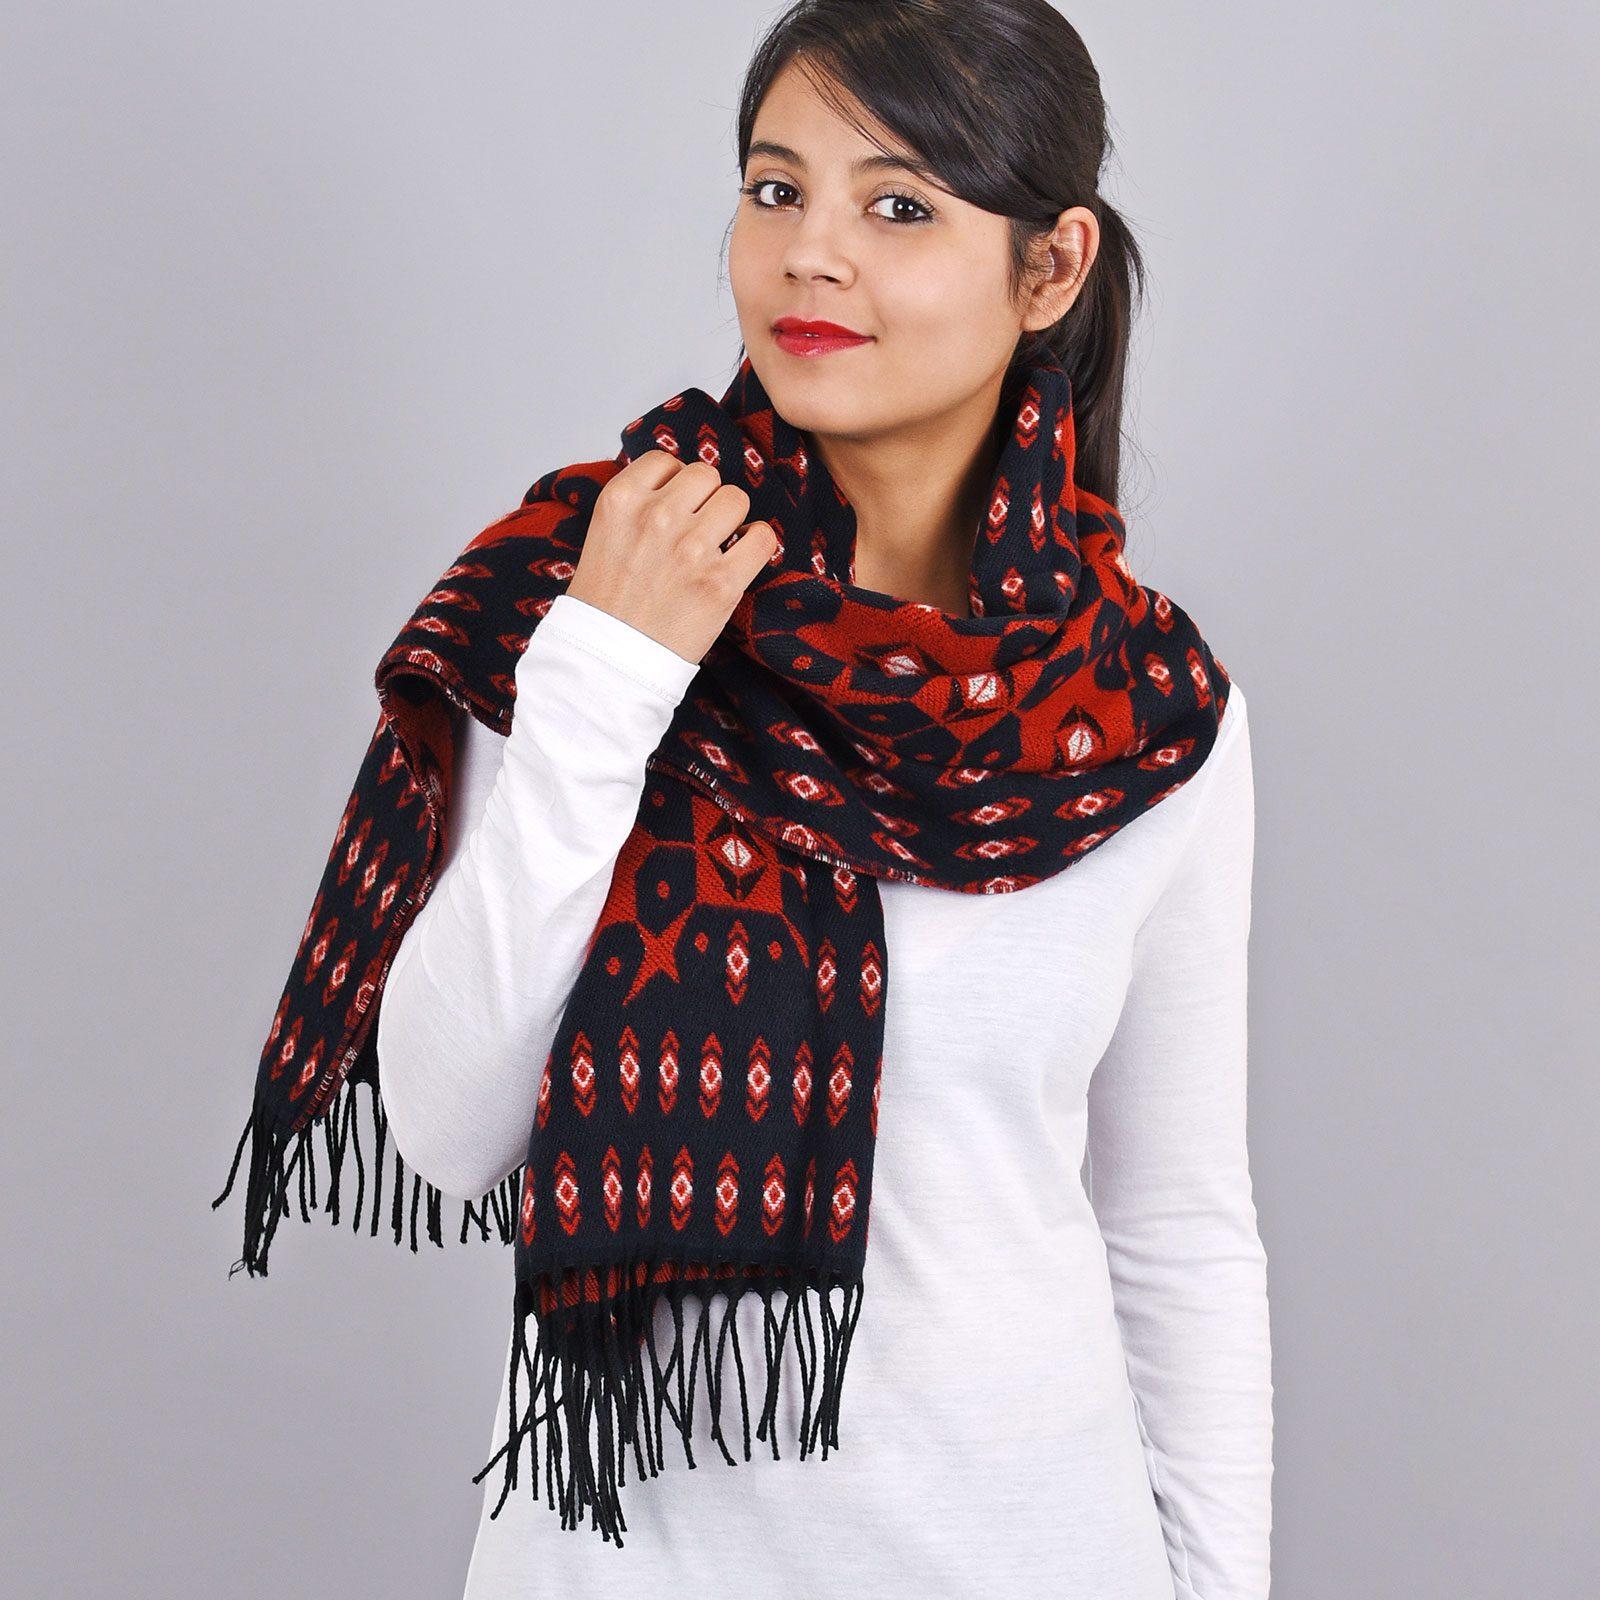 http://lookbook.allee-du-foulard.fr/wp-content/uploads/2018/11/AT-03461-VF16-1-chale-femme-motifs-geometriques-marine-rouge-1600x1600.jpg